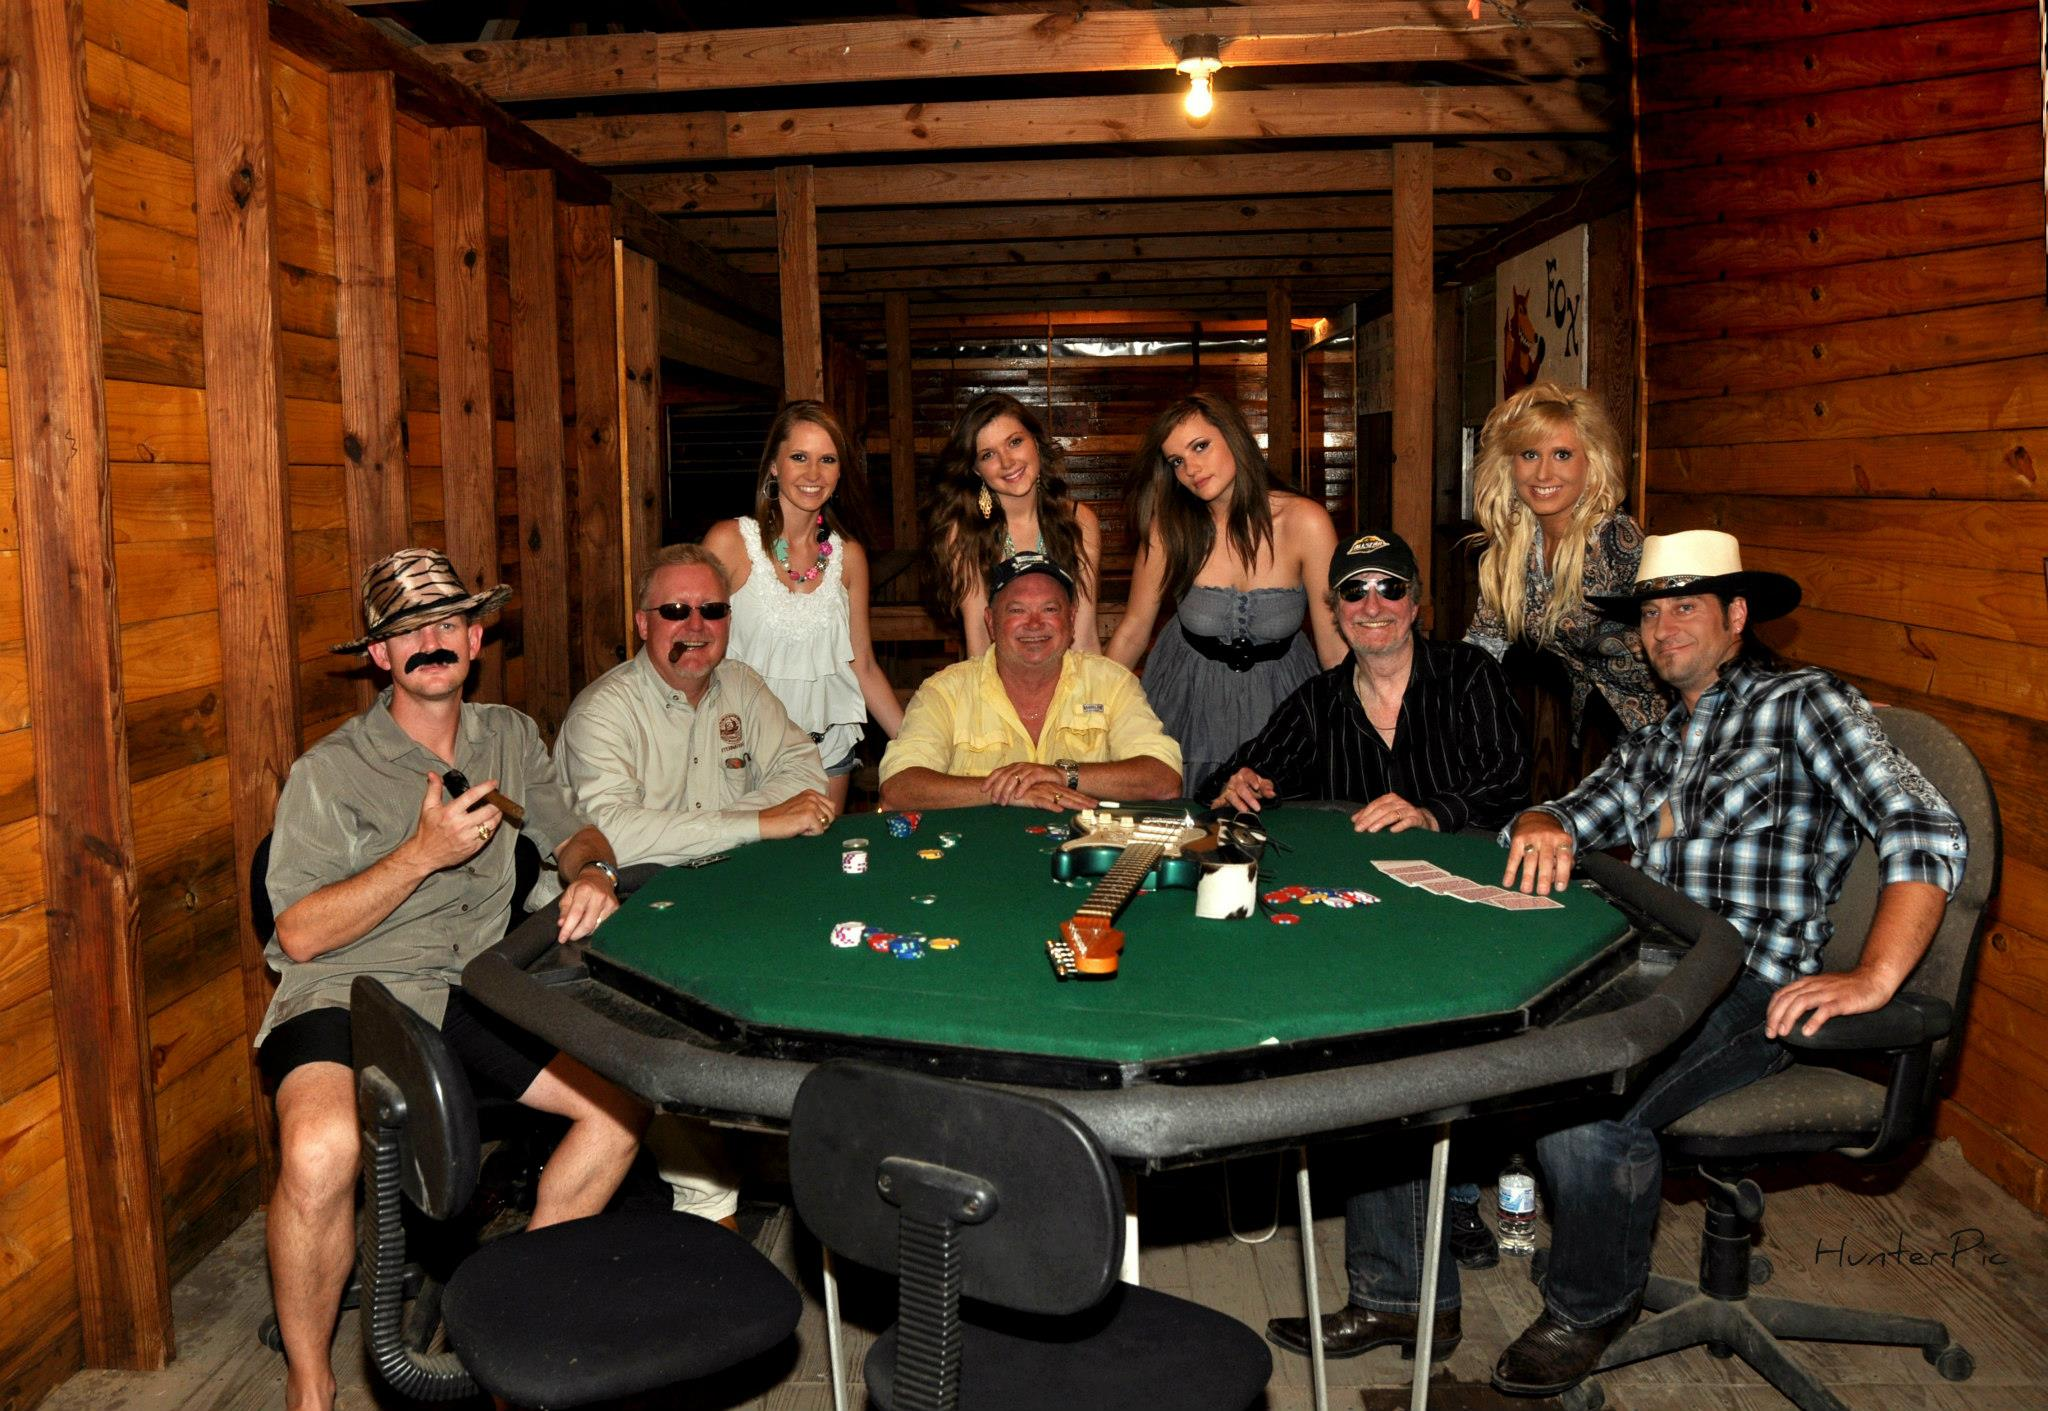 Midland texas tx poker casino bonus casino code gaming online real time